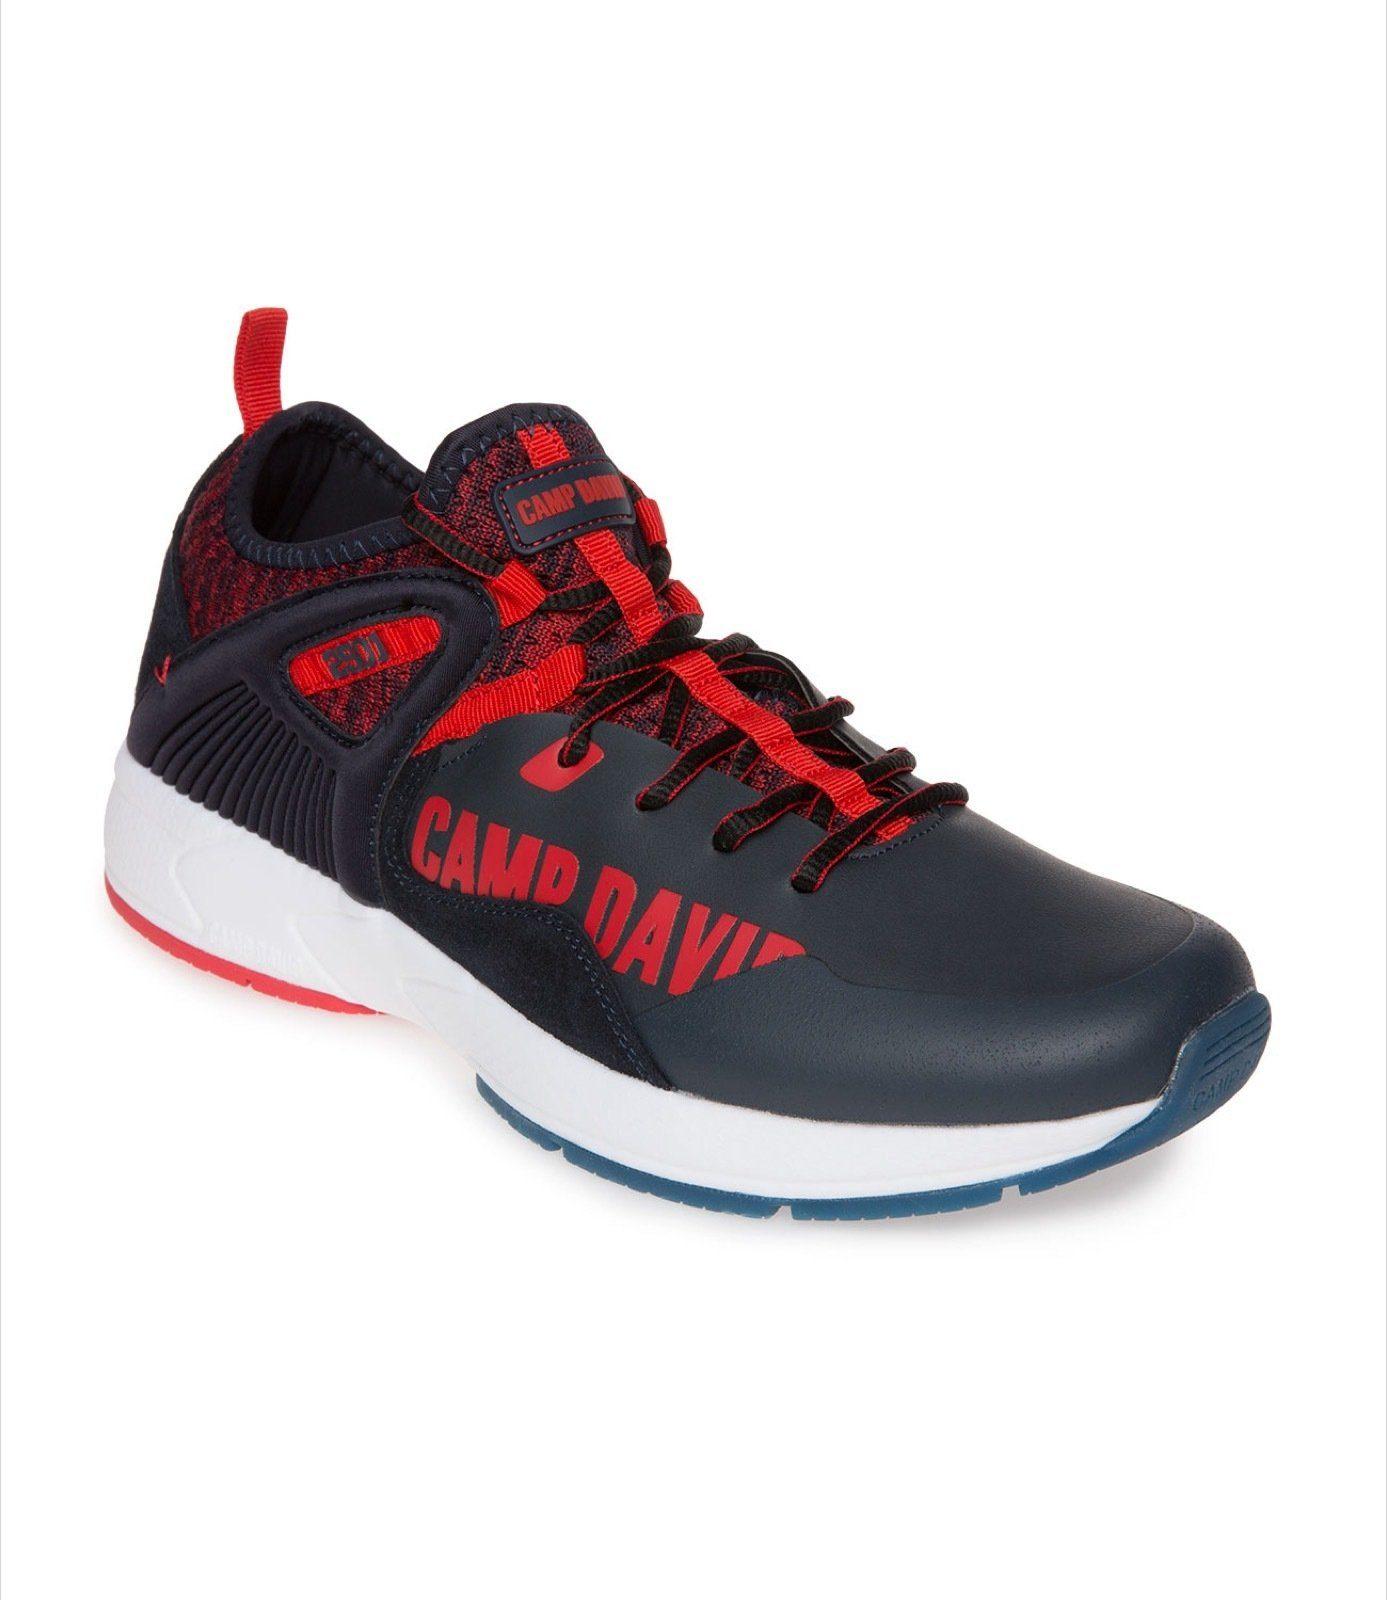 CAMP DAVID Sneaker mit Label-Print